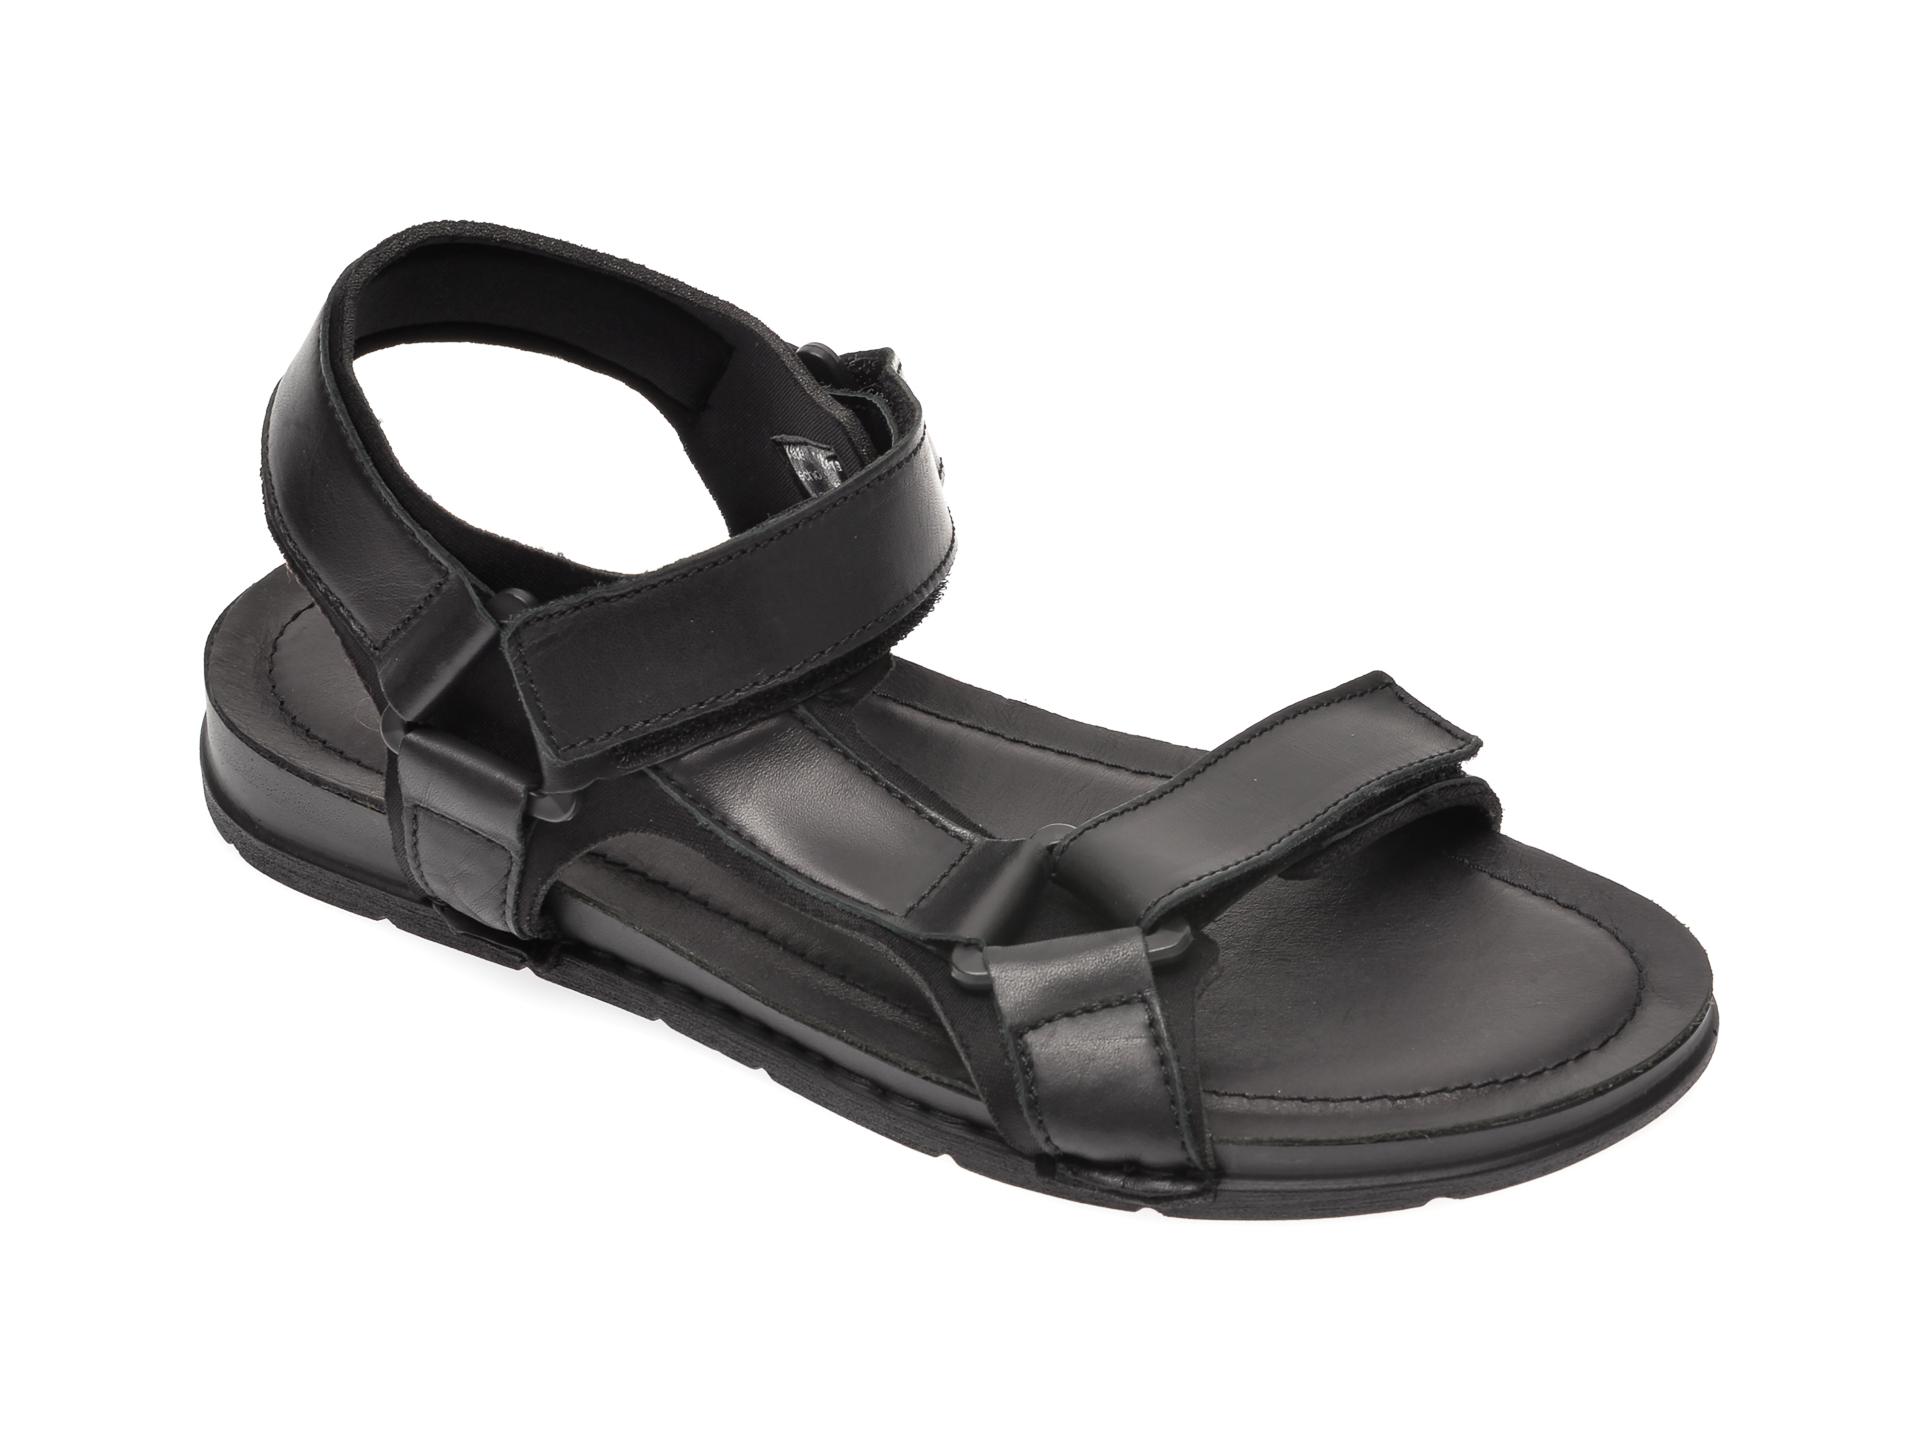 Sandale Aldo Negre, Uligolian001, Din Piele Naturala